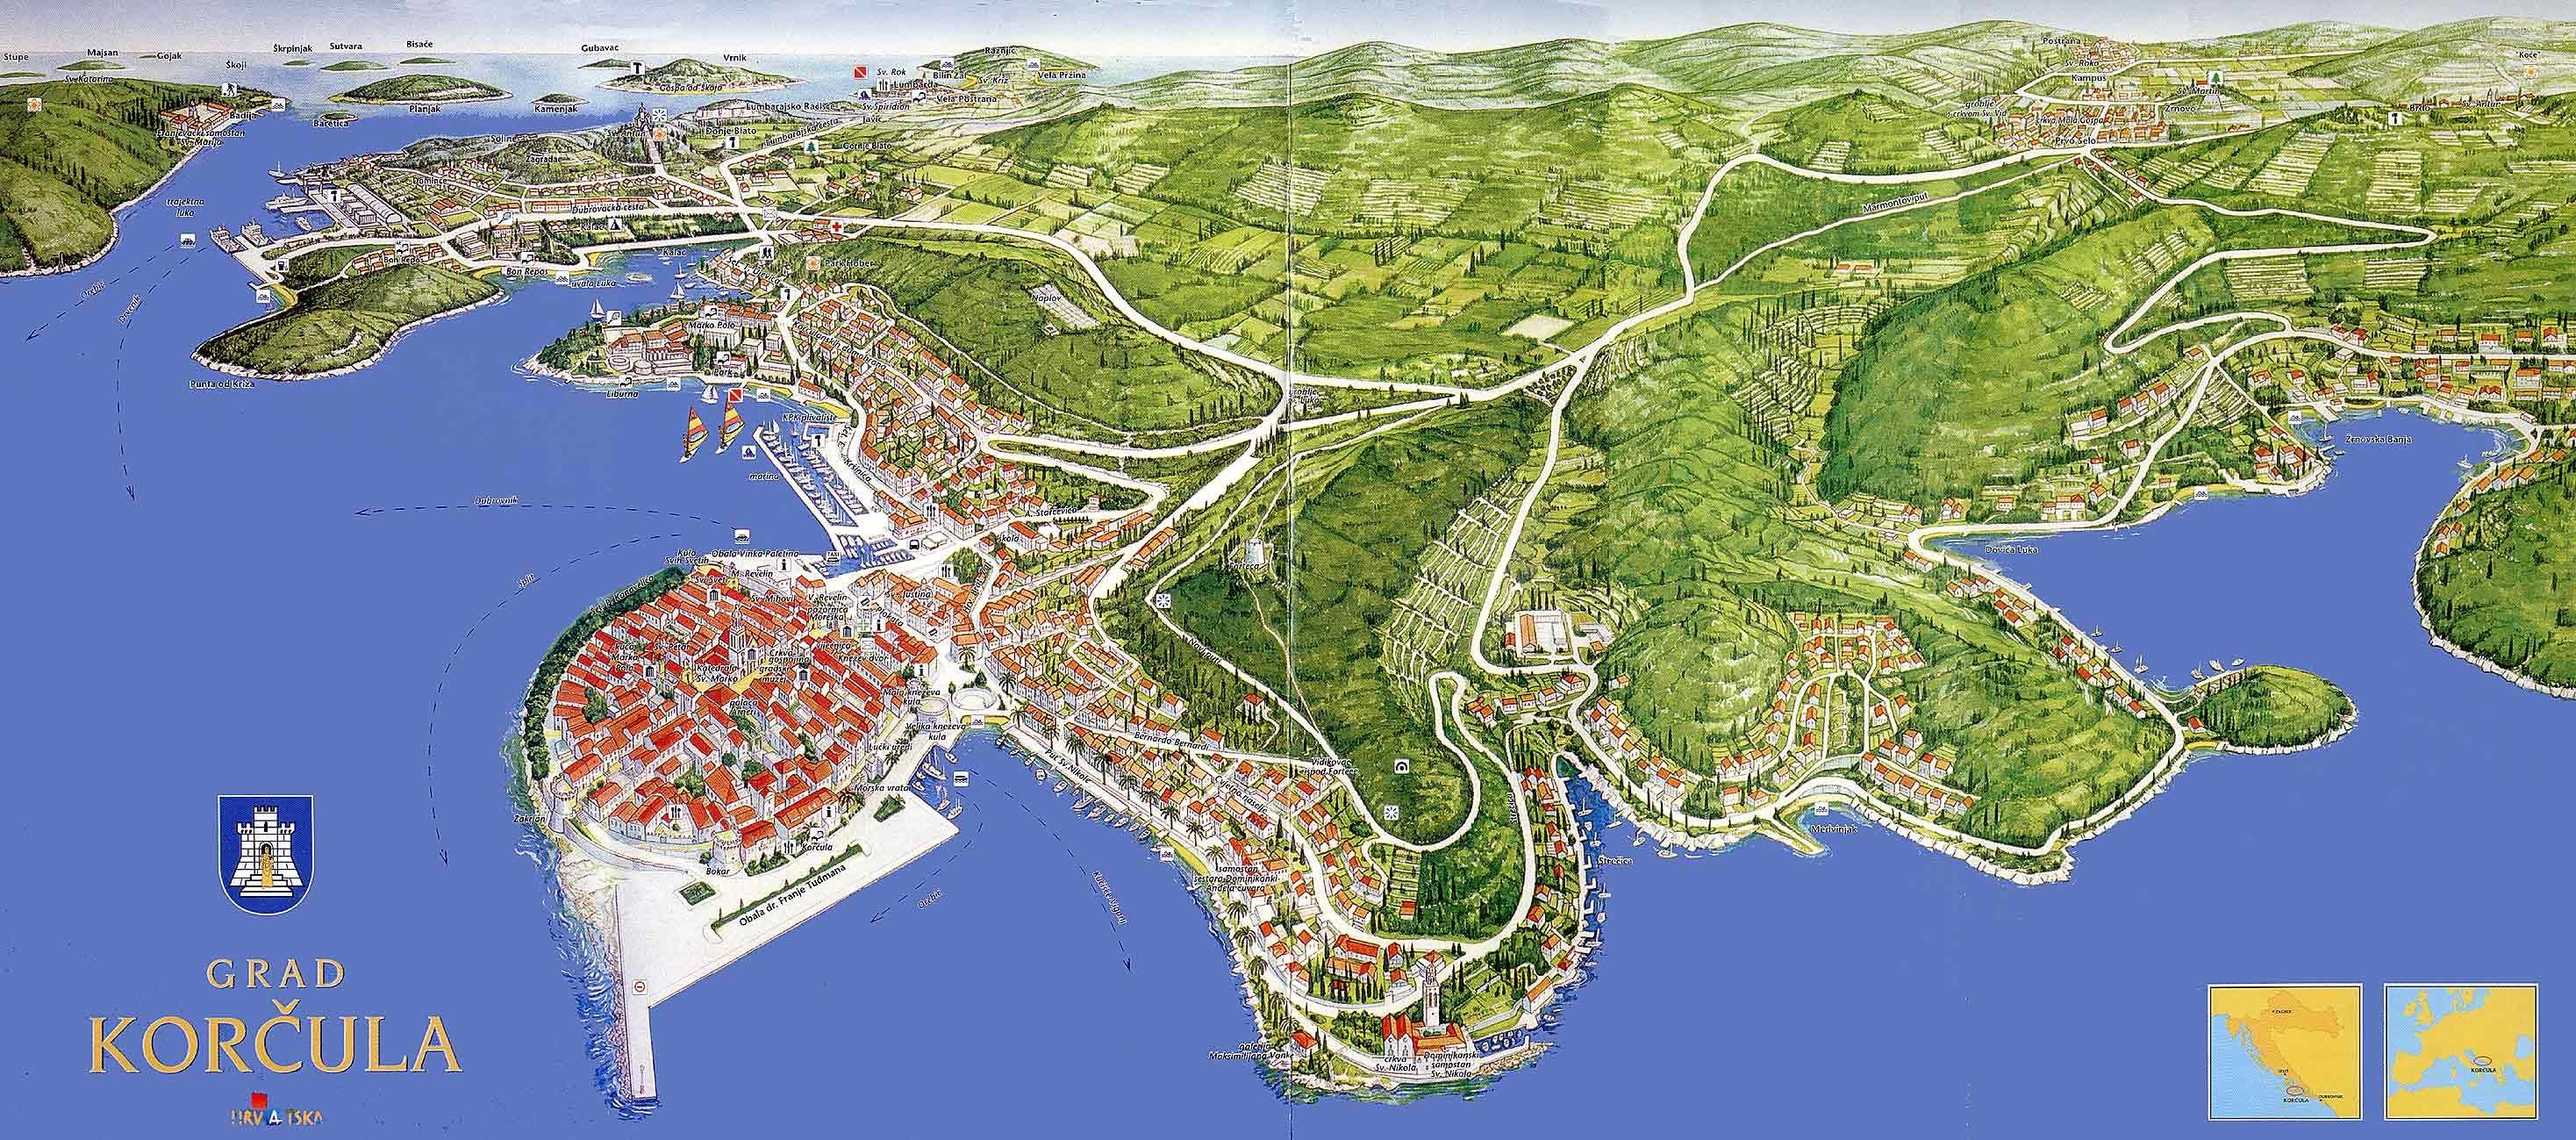 Korcula Map Of Korcula Town Island Korcula Croatia Dalmatia